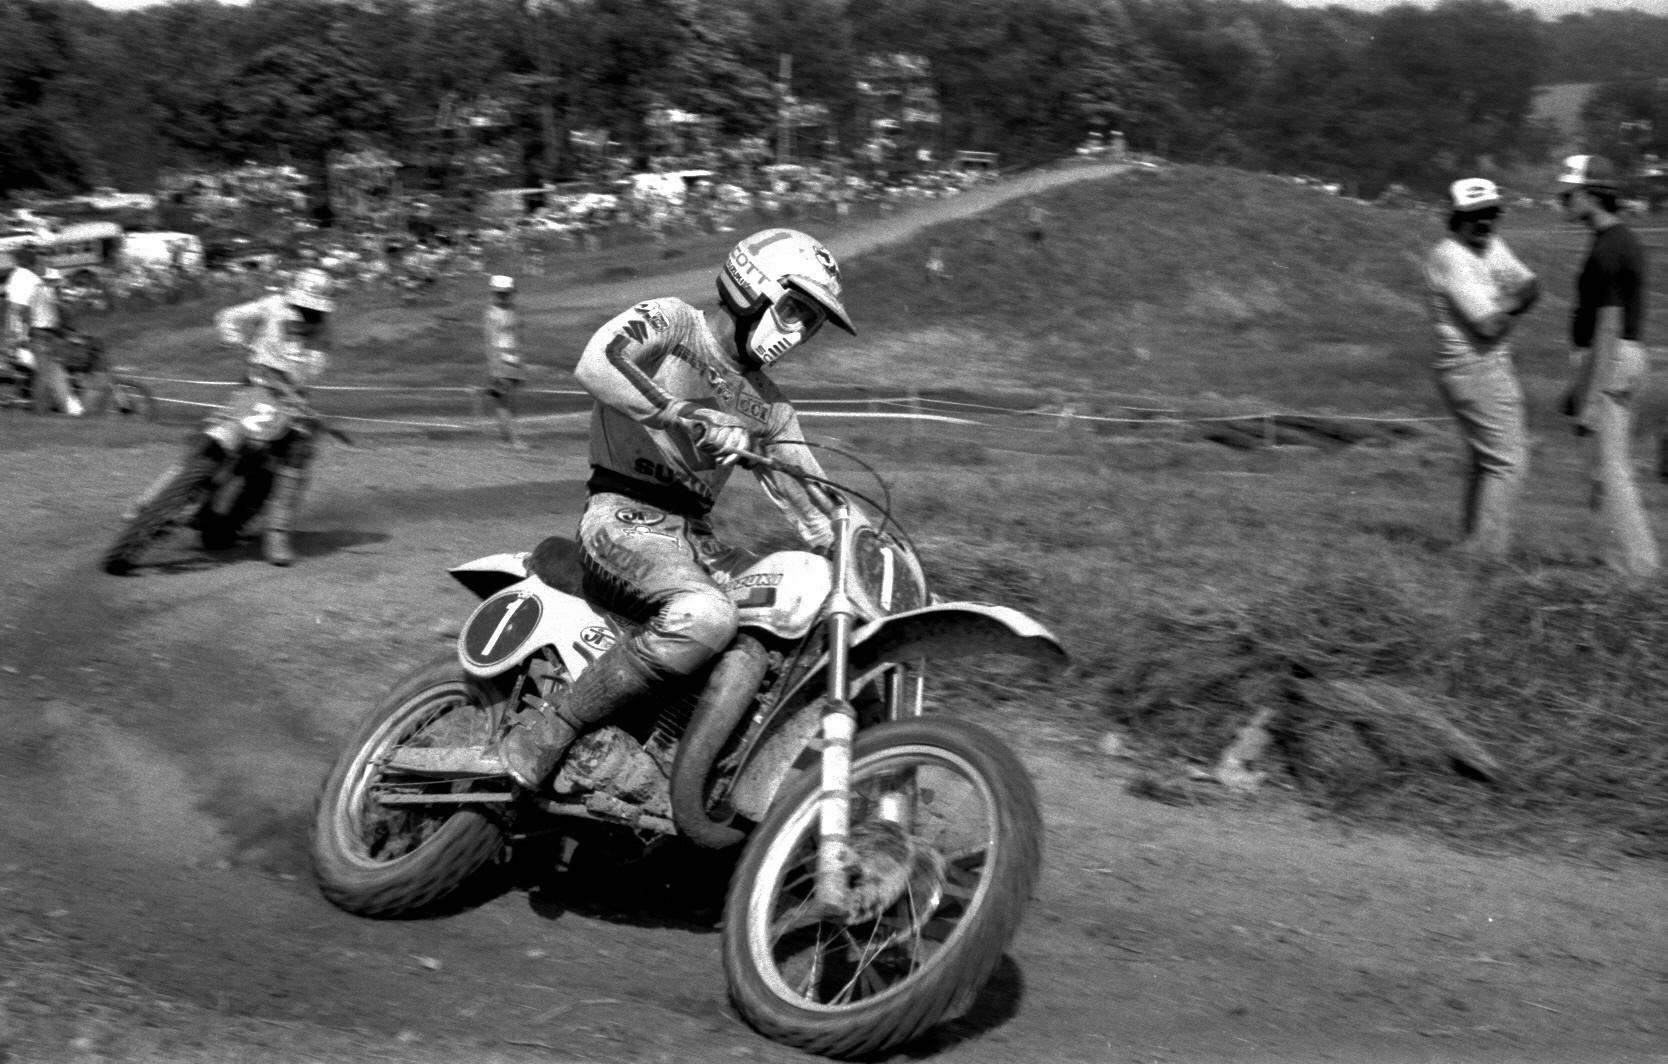 kent howerton � suzuki motocross � howerton012 robert w